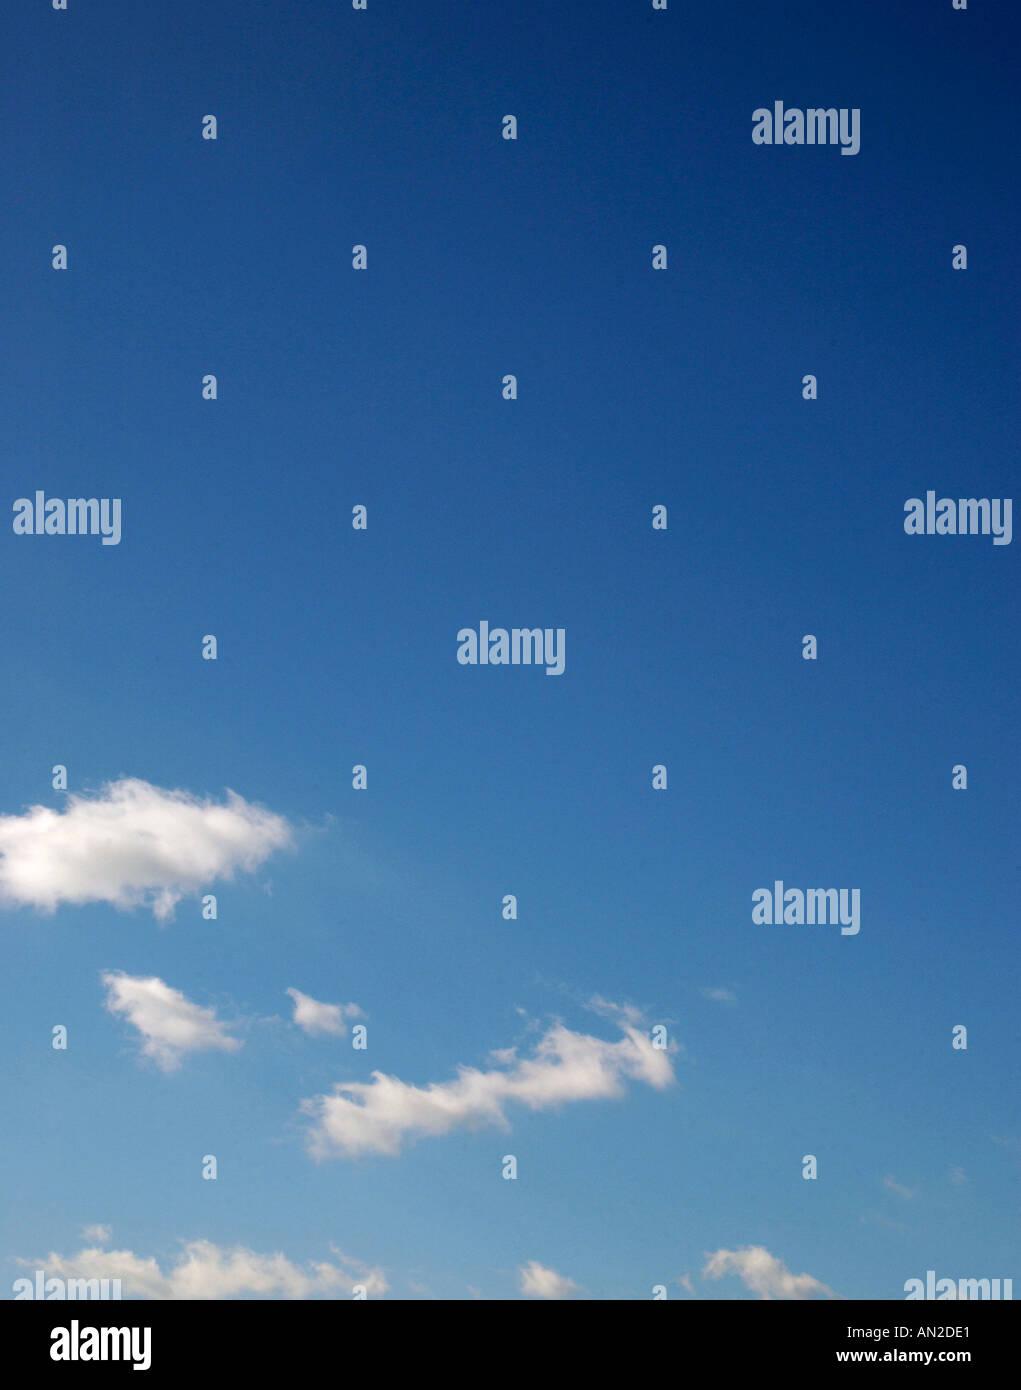 Carolina blue sky background USA - Stock Image